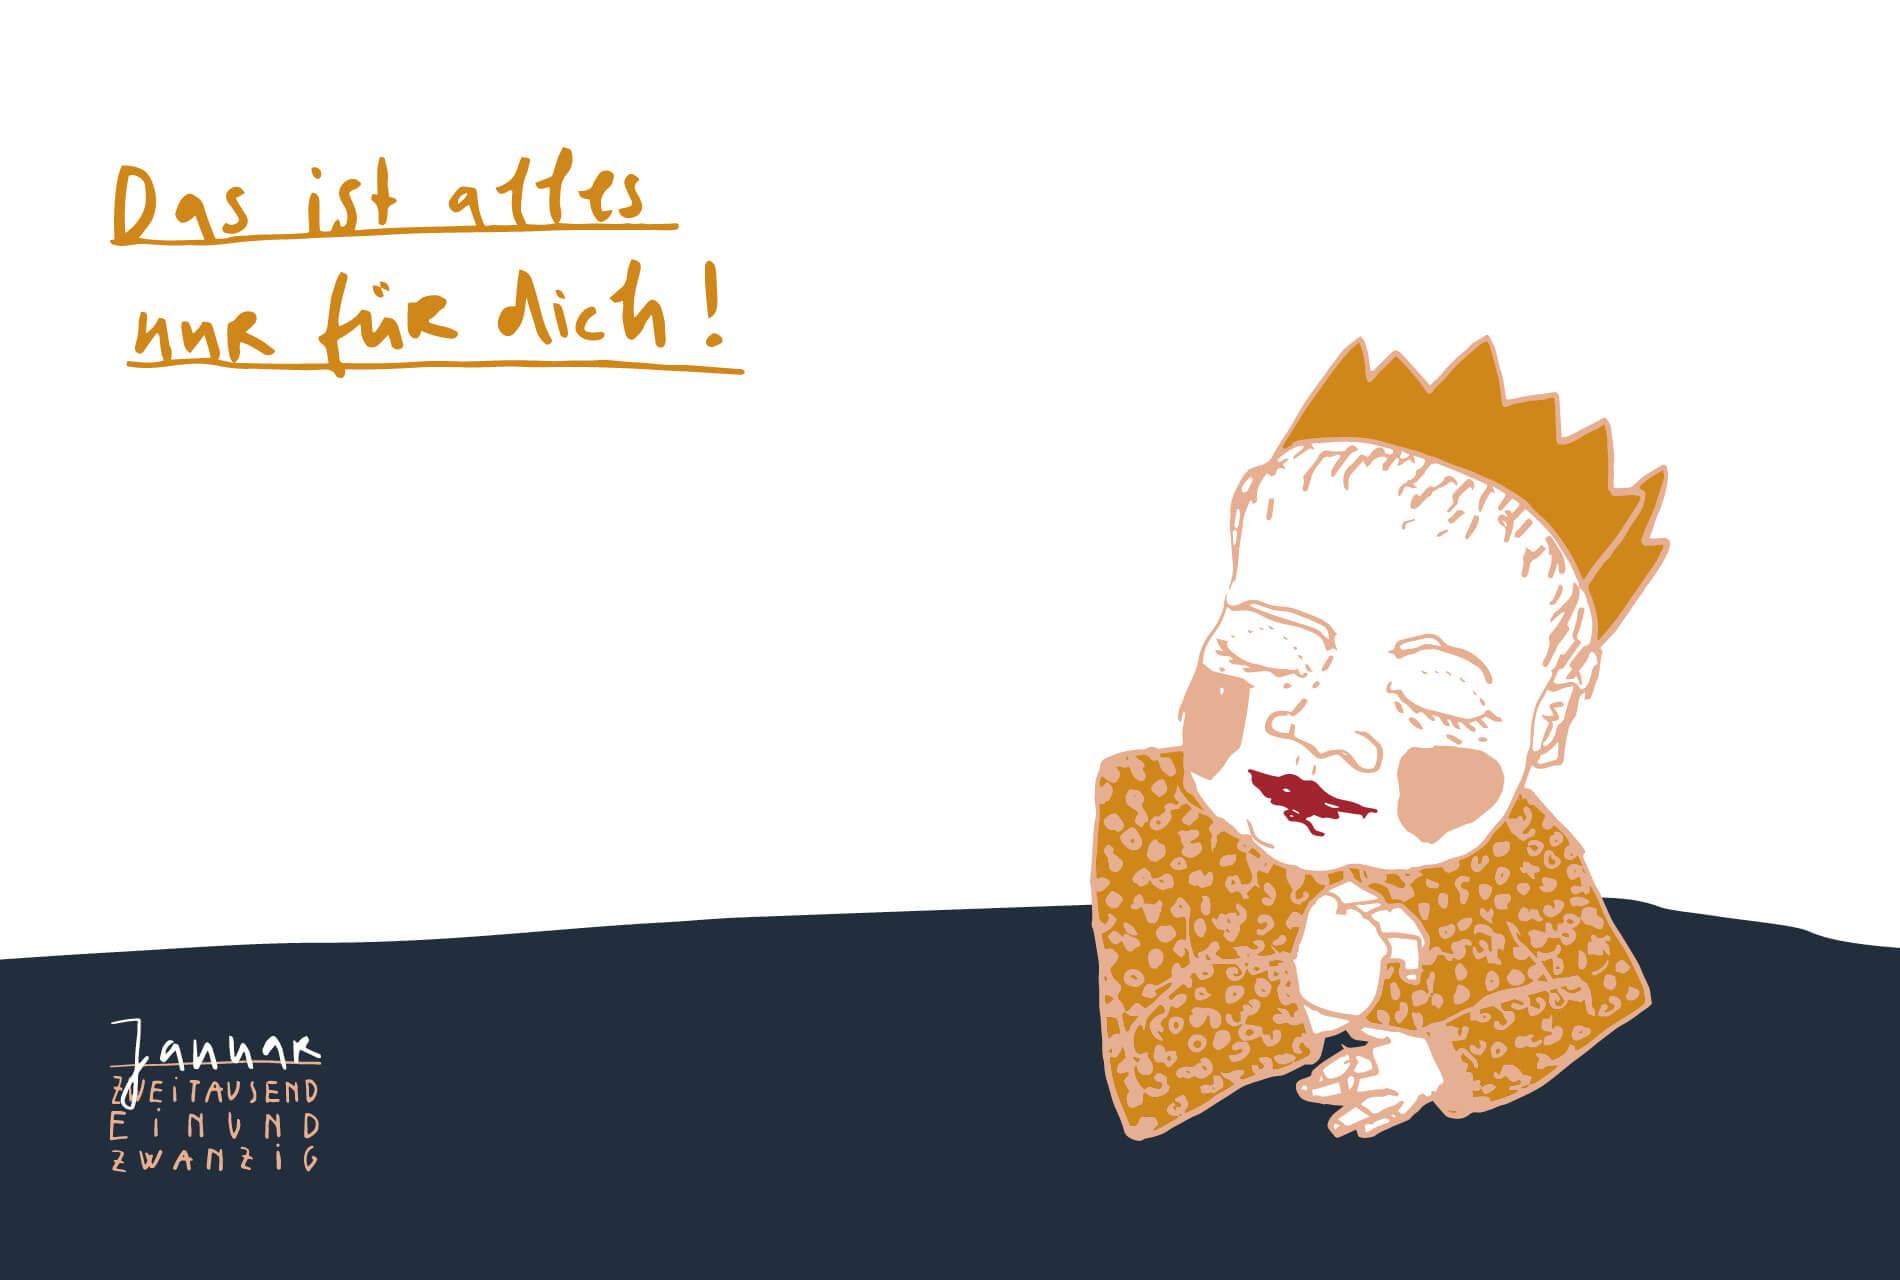 Matrosenhunde Illustration zeichnung Kalender 2021 Matrosenhunde Illustration Zeichnung Illustratorin Text Prosa Monatskalender Januar Kunstkalender Illustrationskalender Das ist alles nur für dich